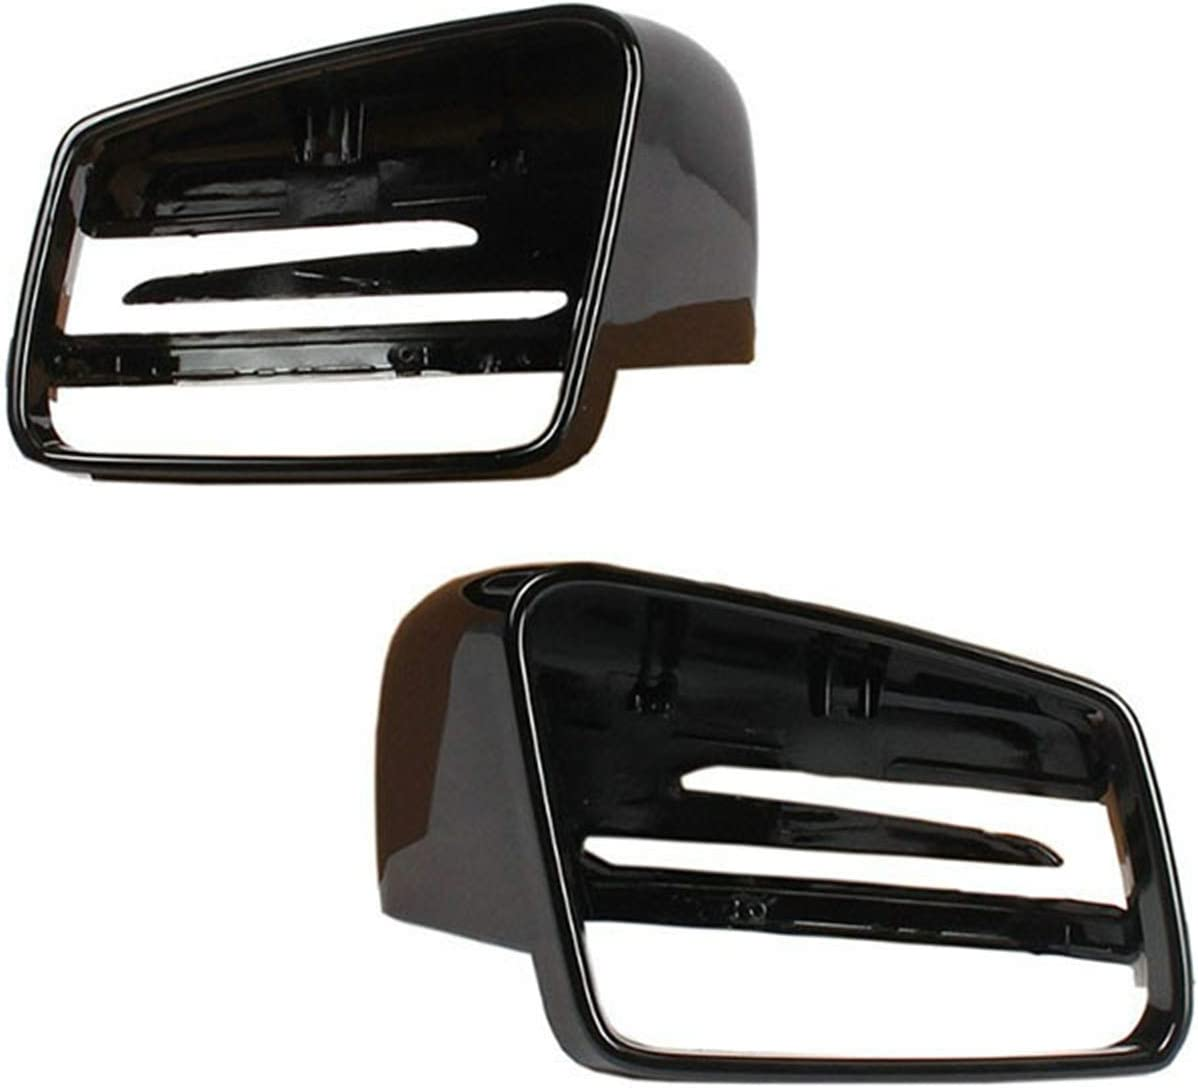 LQIAN Arlington Mall Door Mirror Cover Car Rearview Blac Max 61% OFF Wing Case